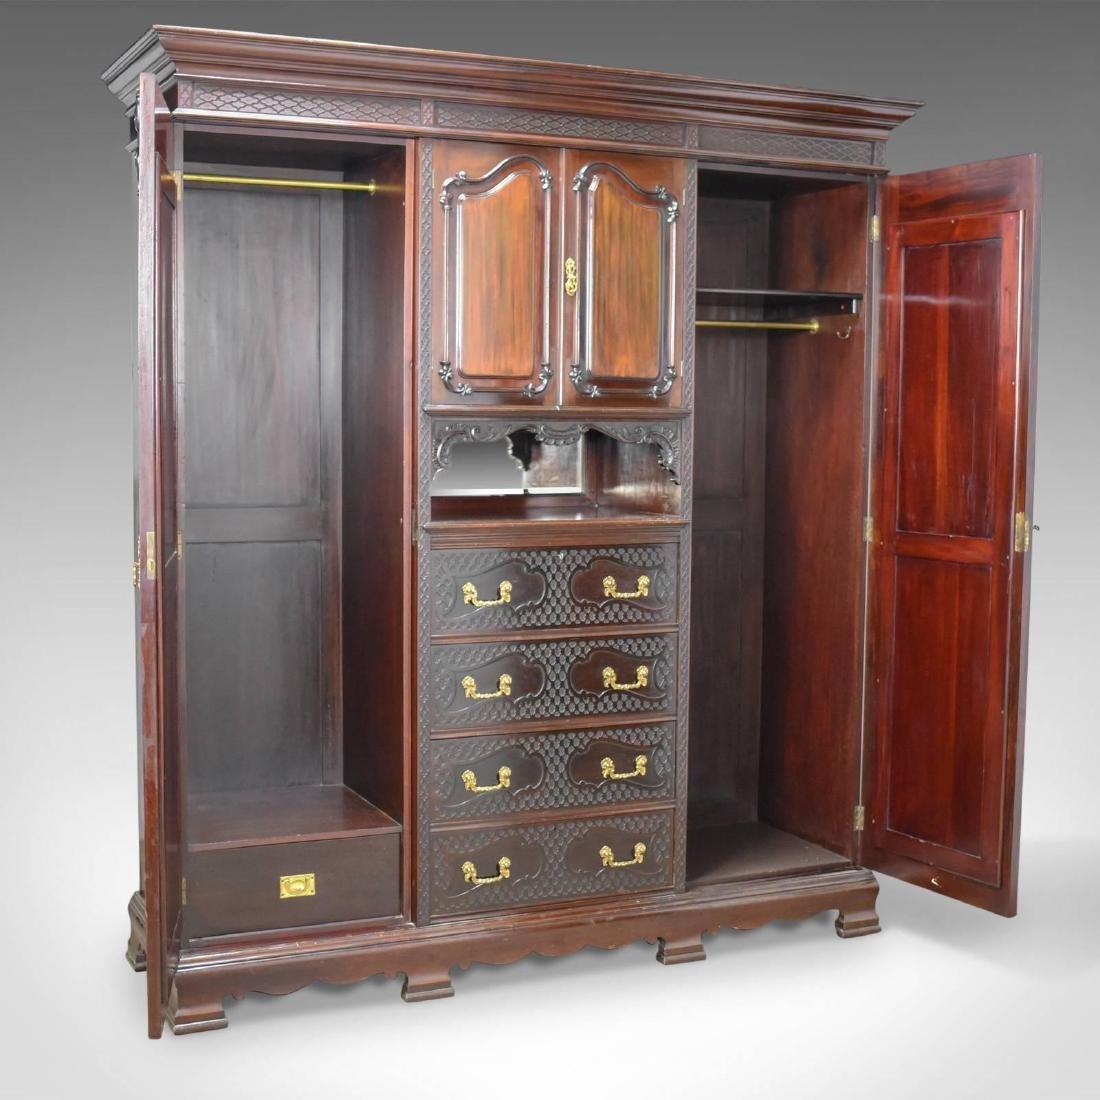 Antique Wardrobe, Carved Mahogany, English, Compactum, - 3